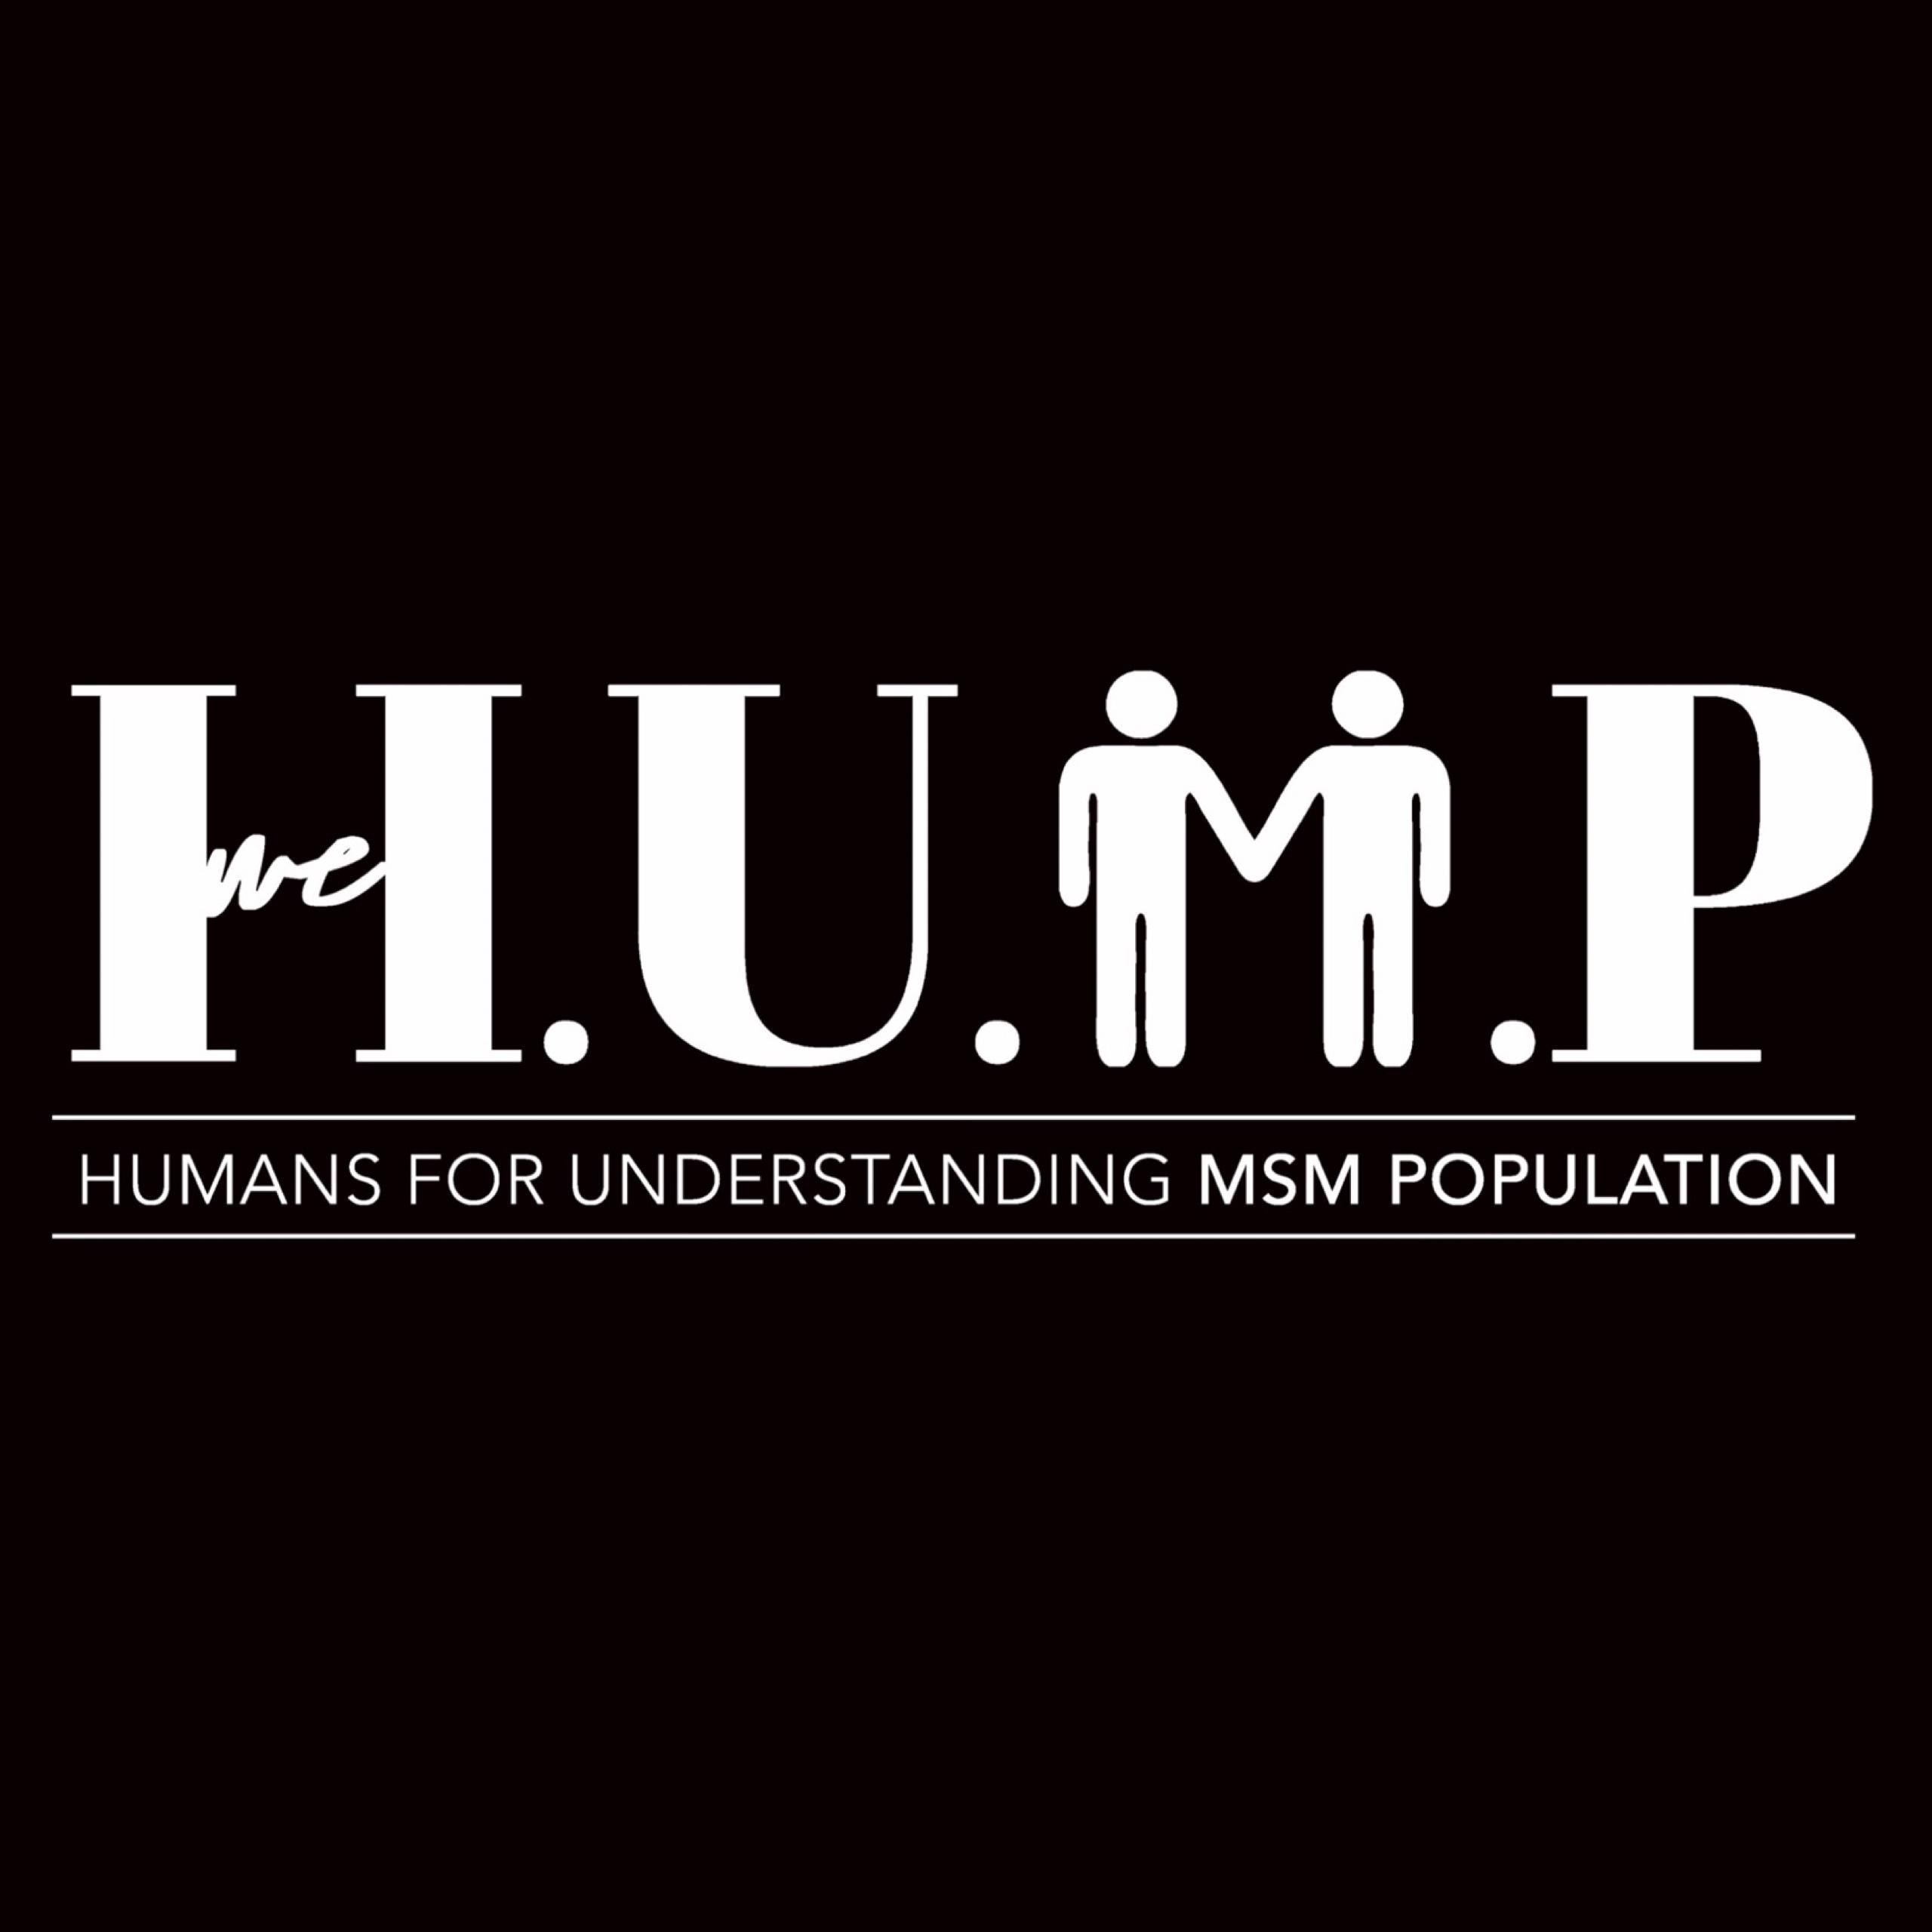 WE HUMP